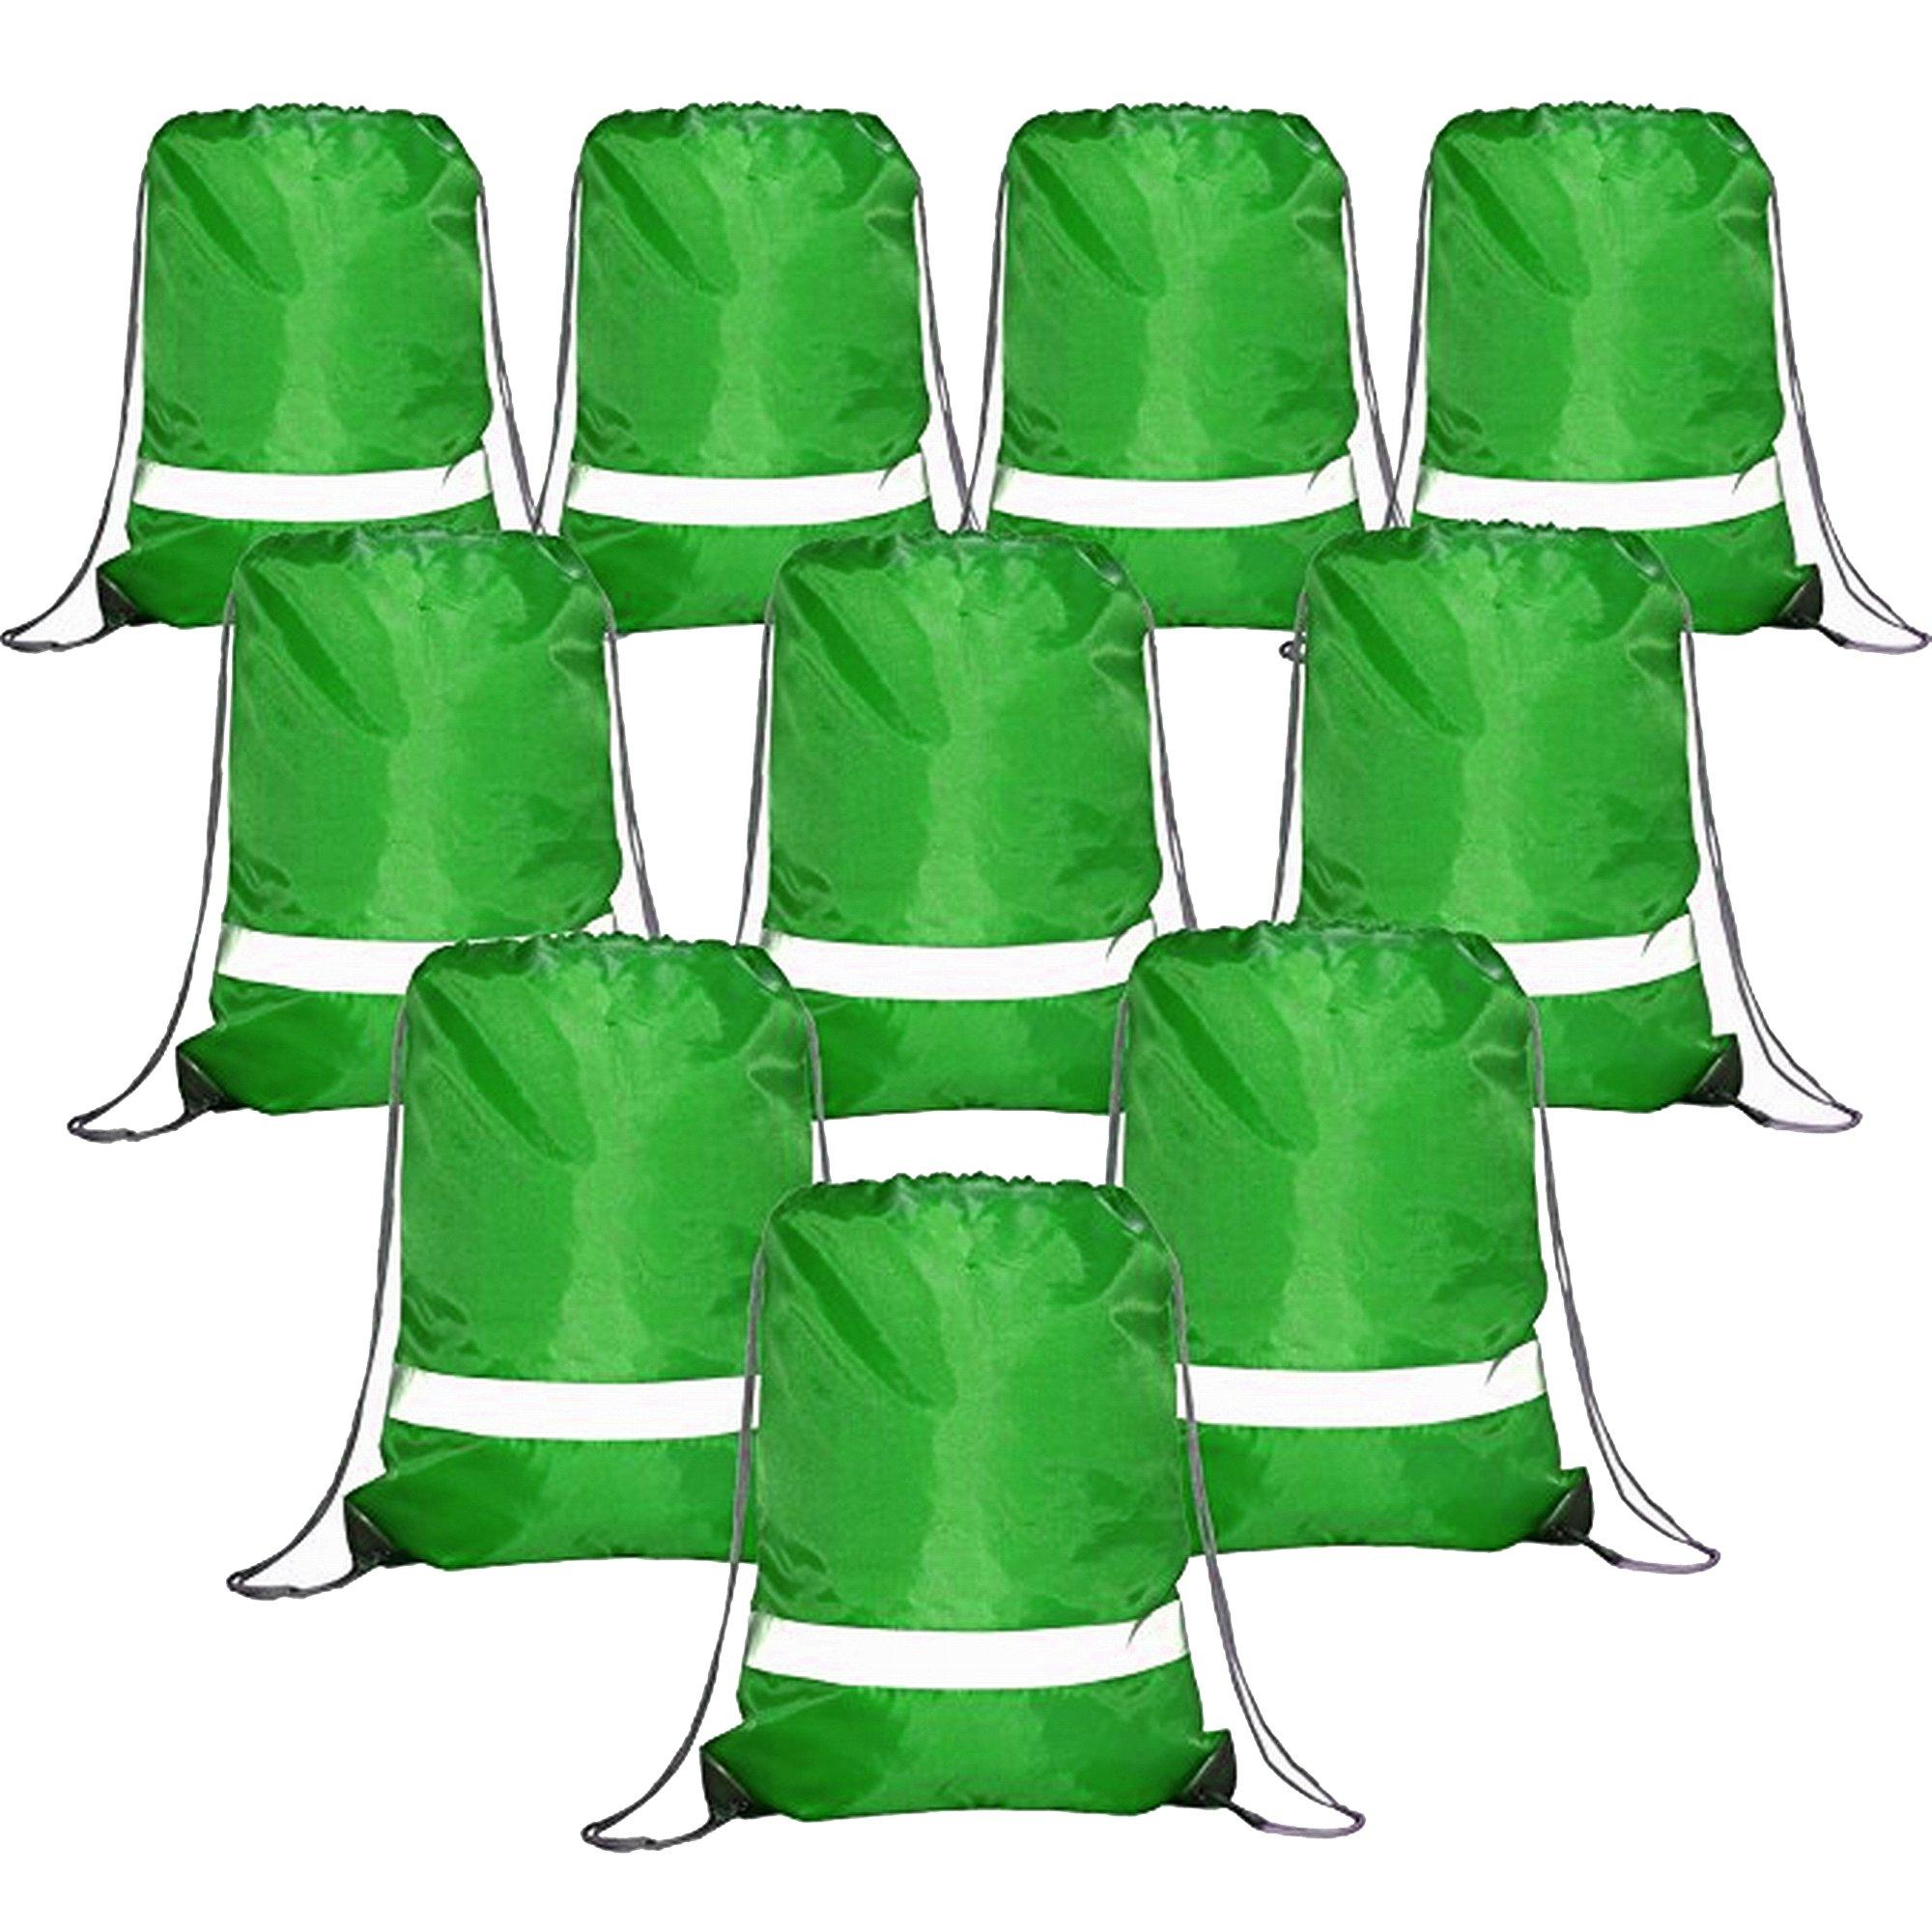 Drawstring Backpack Bags Reflective Bulk Pack, Promotional Sport Gym Sack Cinch Bags (10 Dark Green)